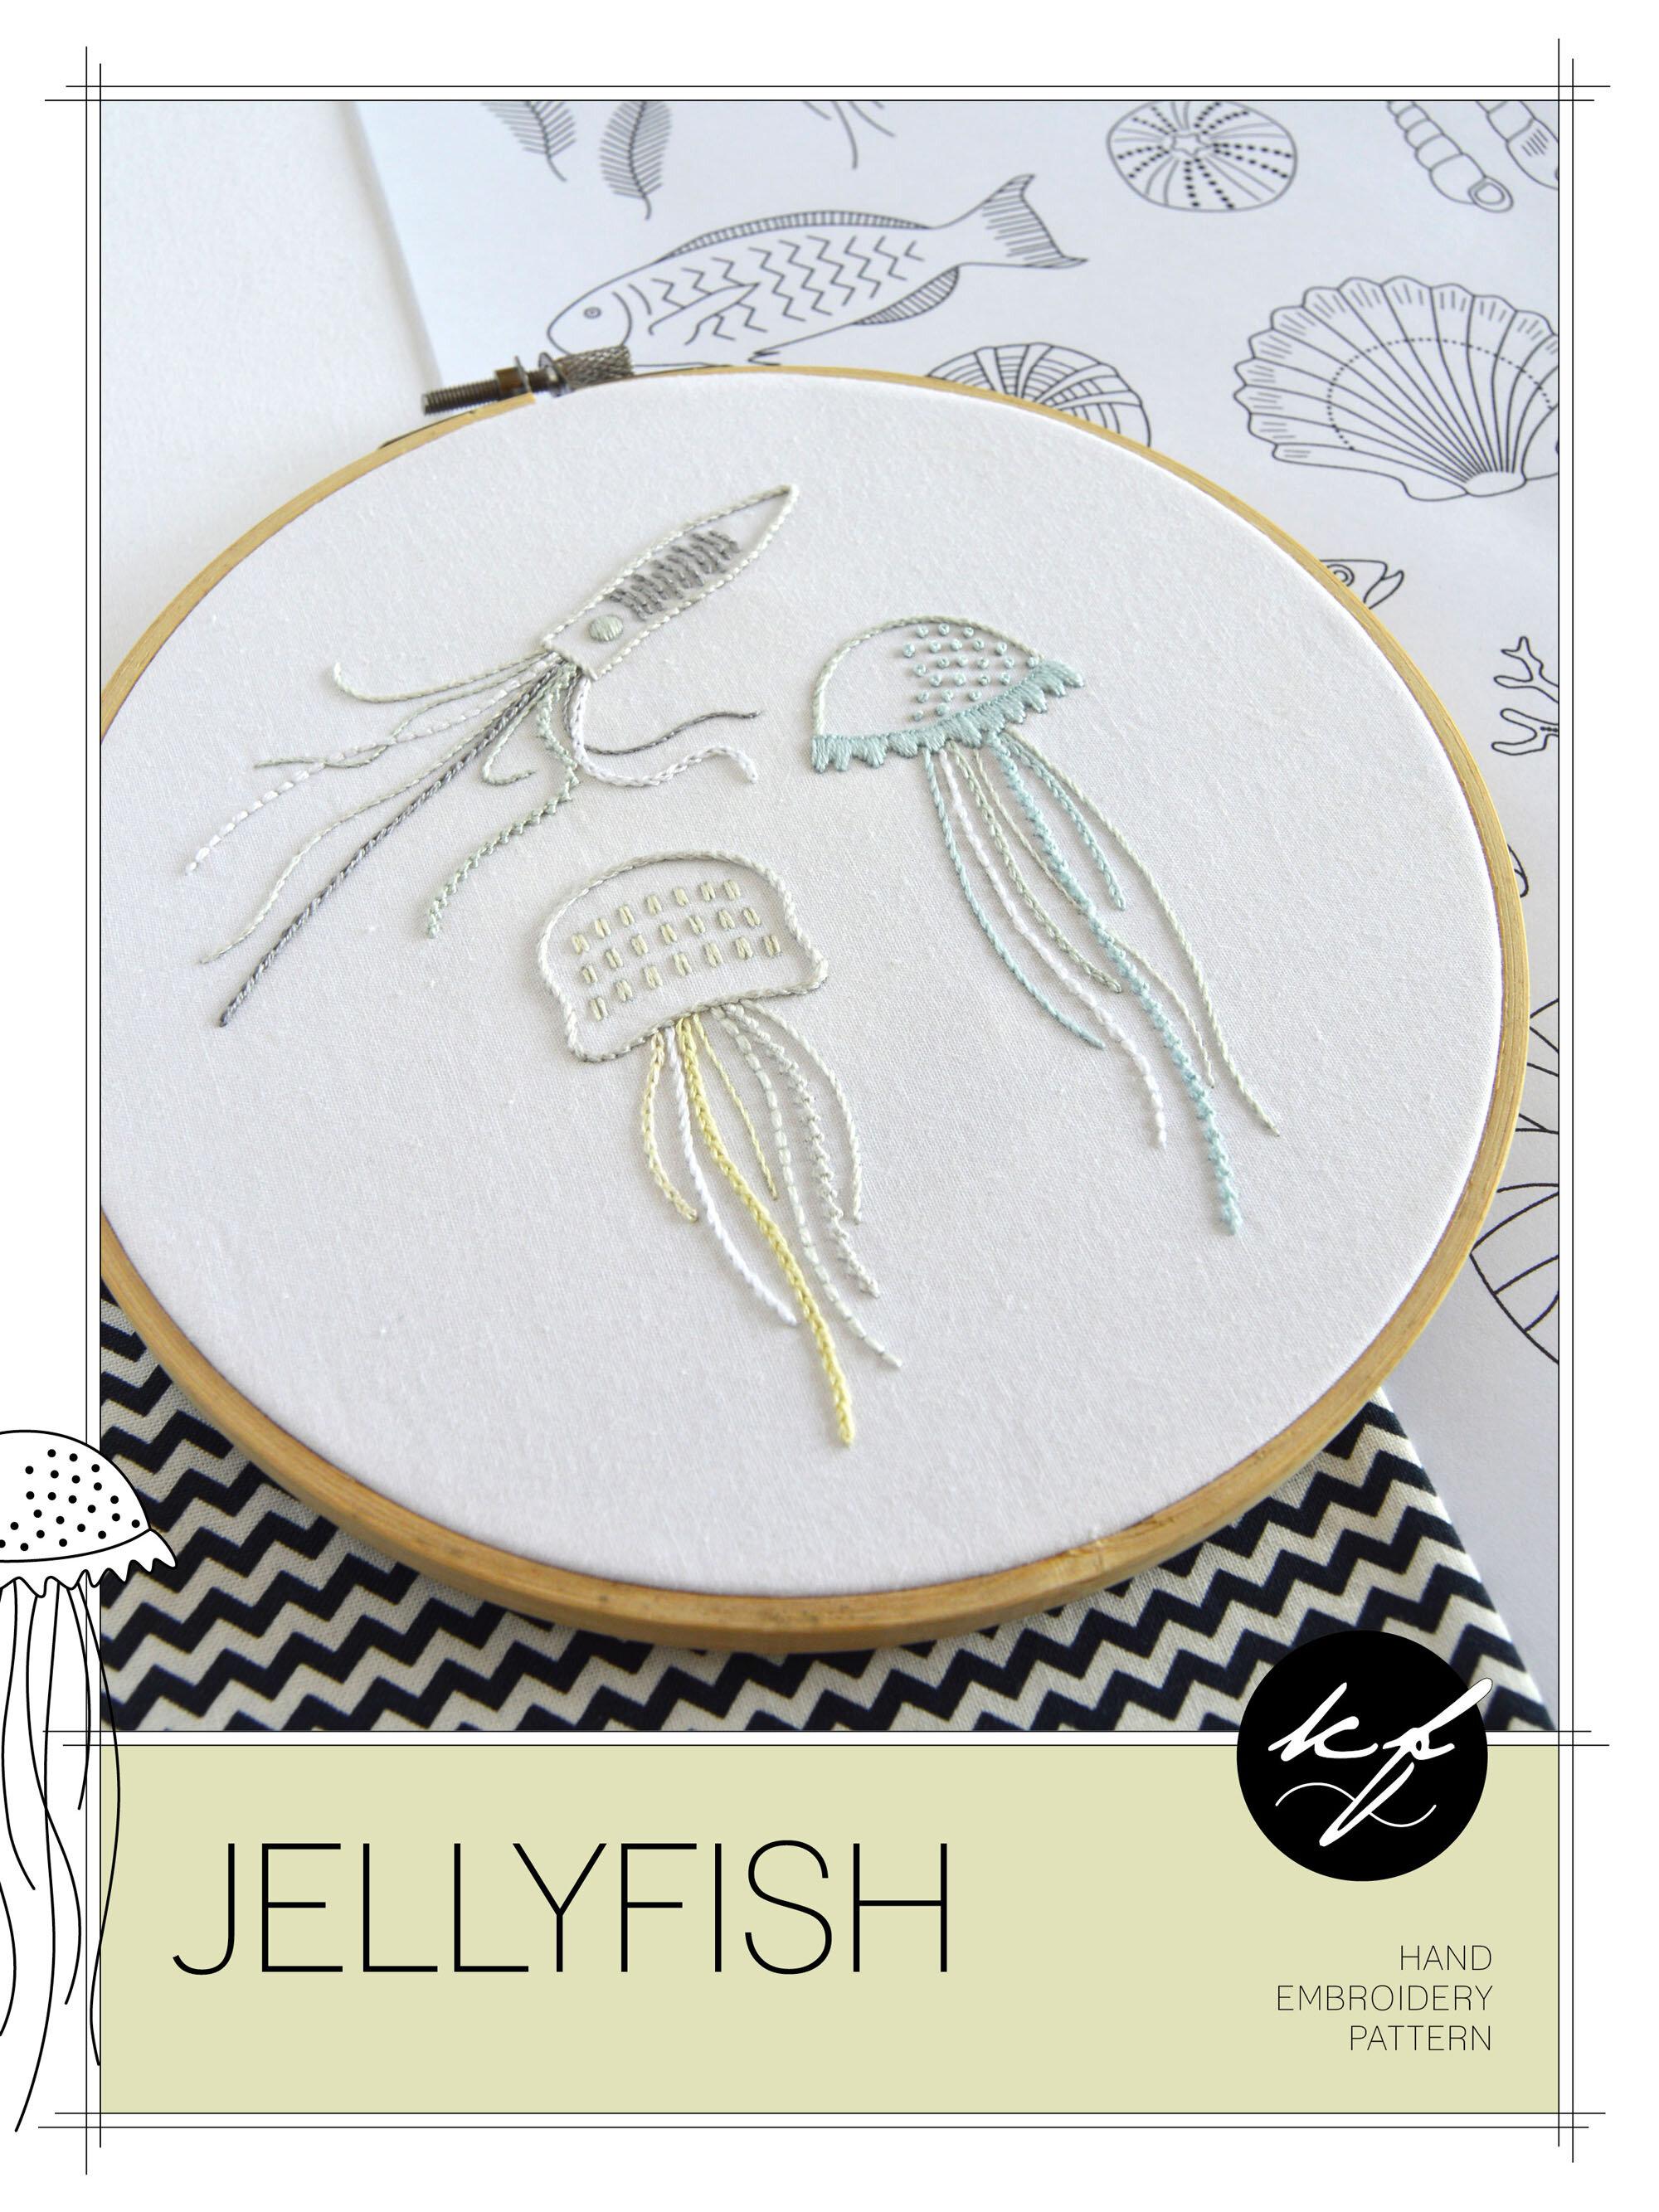 JellyfishEmbroideryPattern_KellyFletcher.jpg